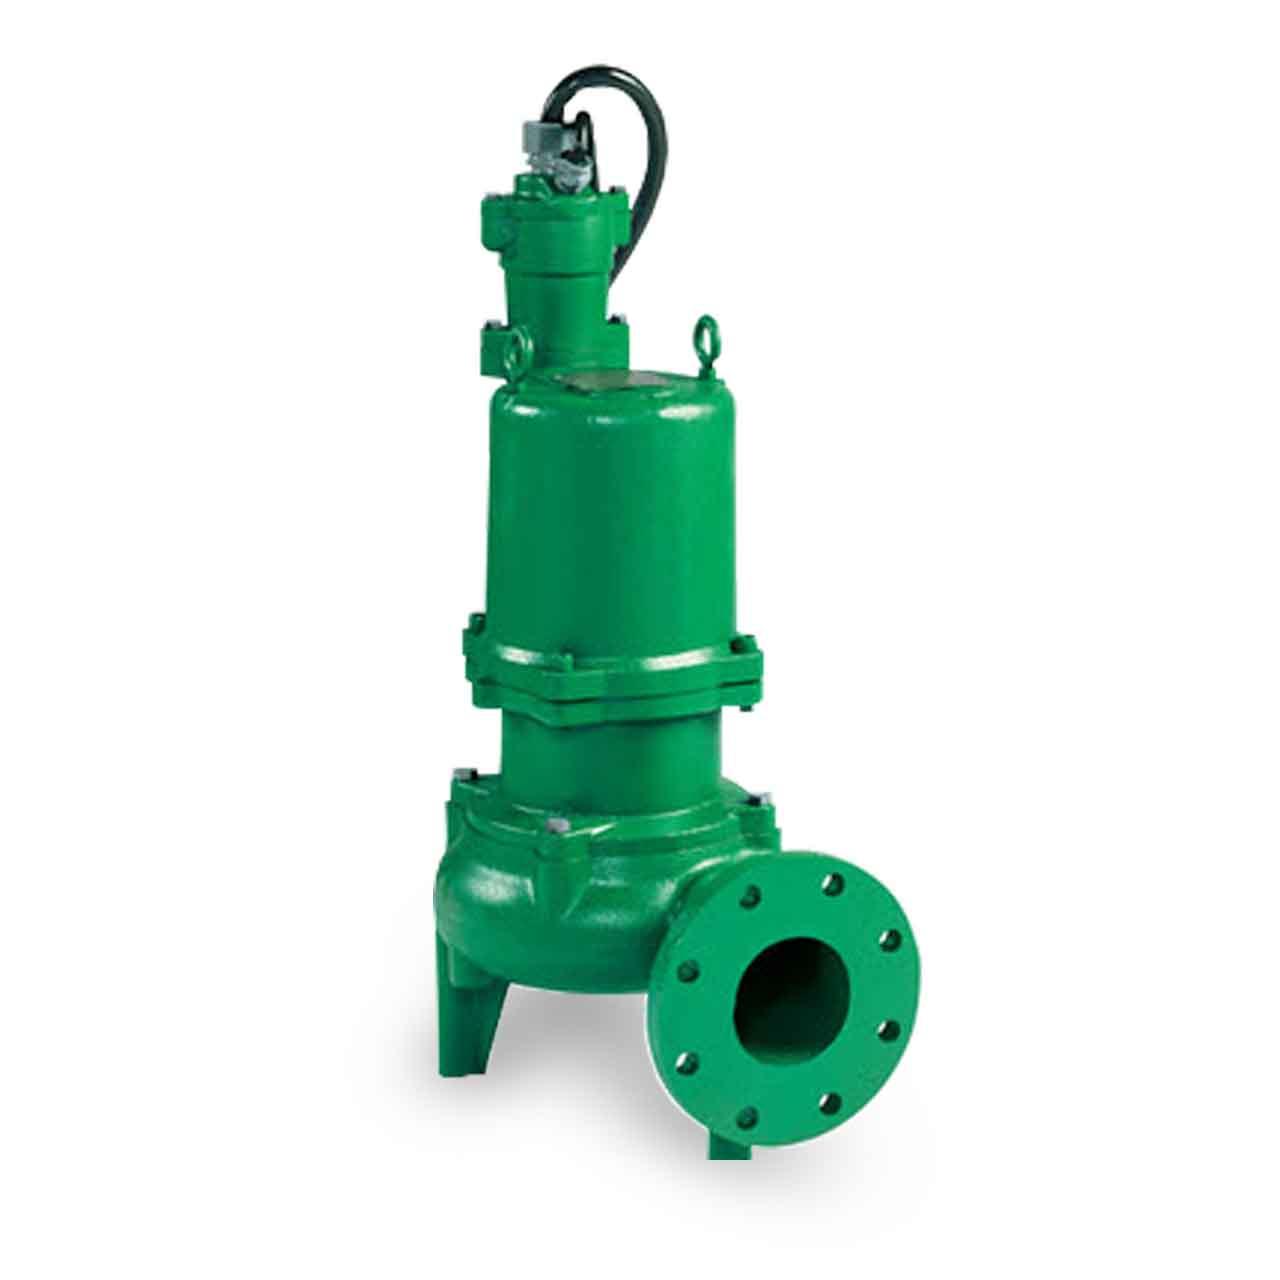 Hydromatic Pump Hydromatic S4nrc750m4 4 Submersible